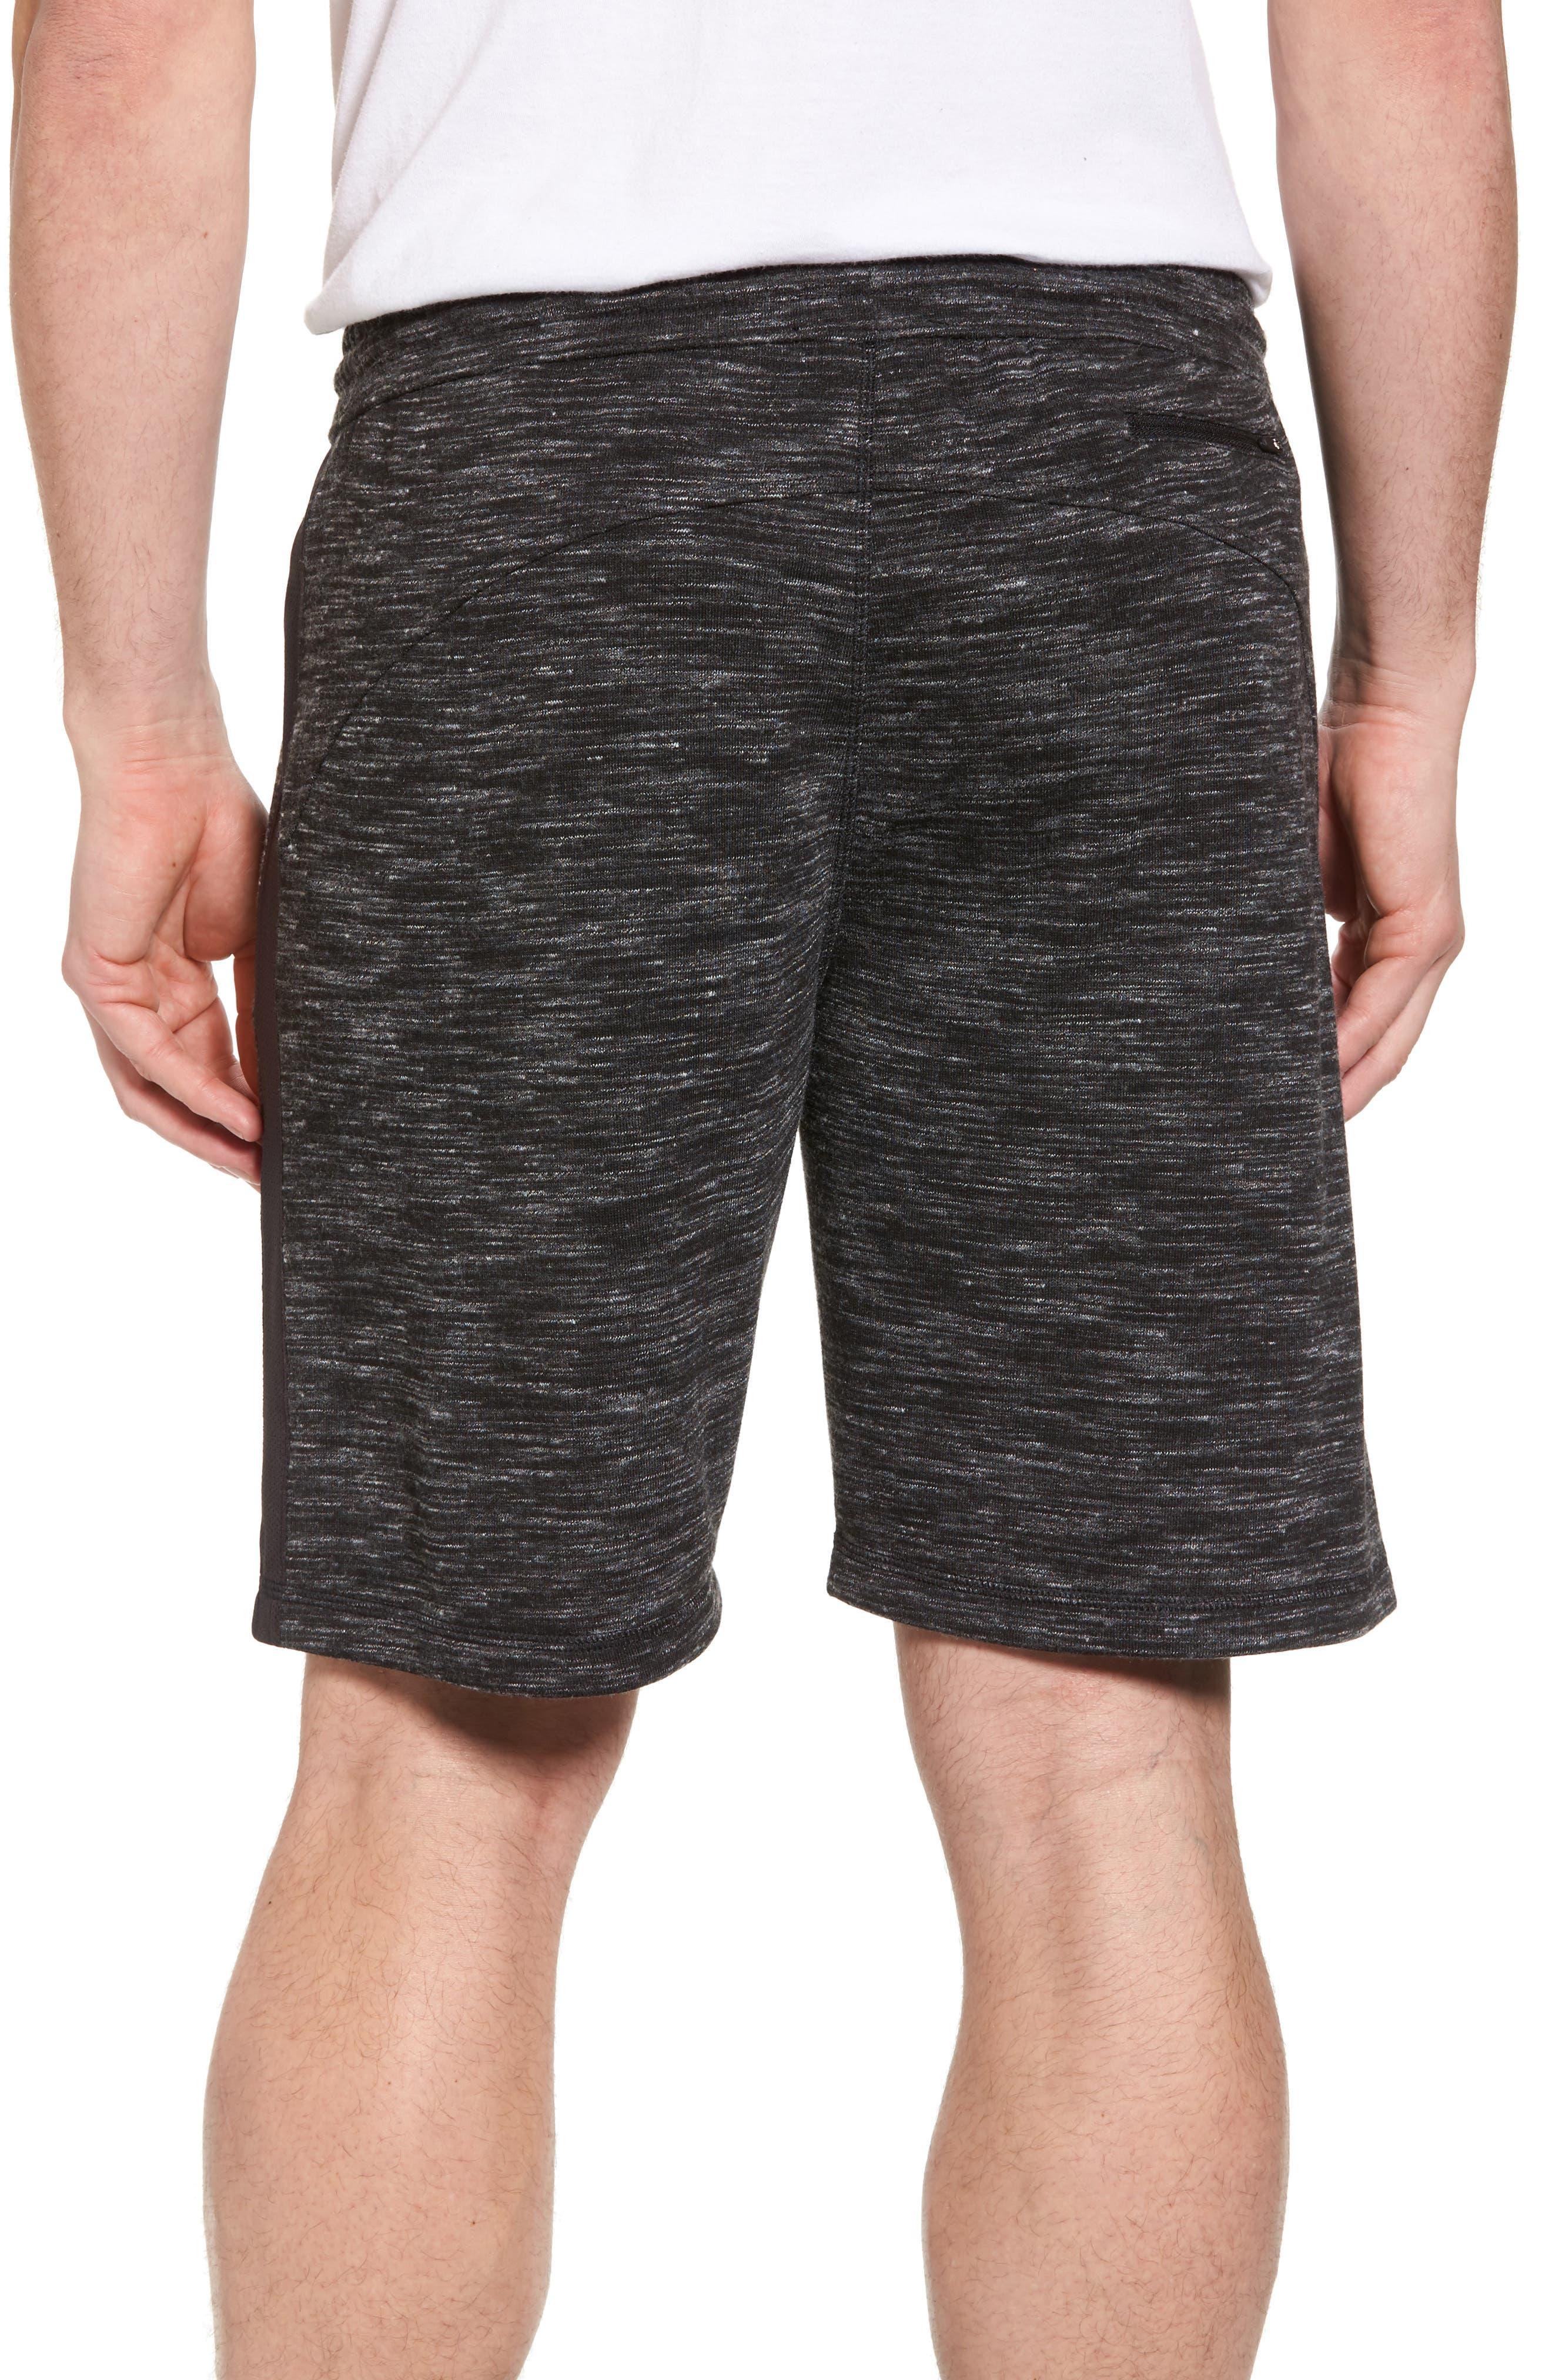 Neptune Terrycloth Shorts,                             Alternate thumbnail 2, color,                             Black Oxide Melange